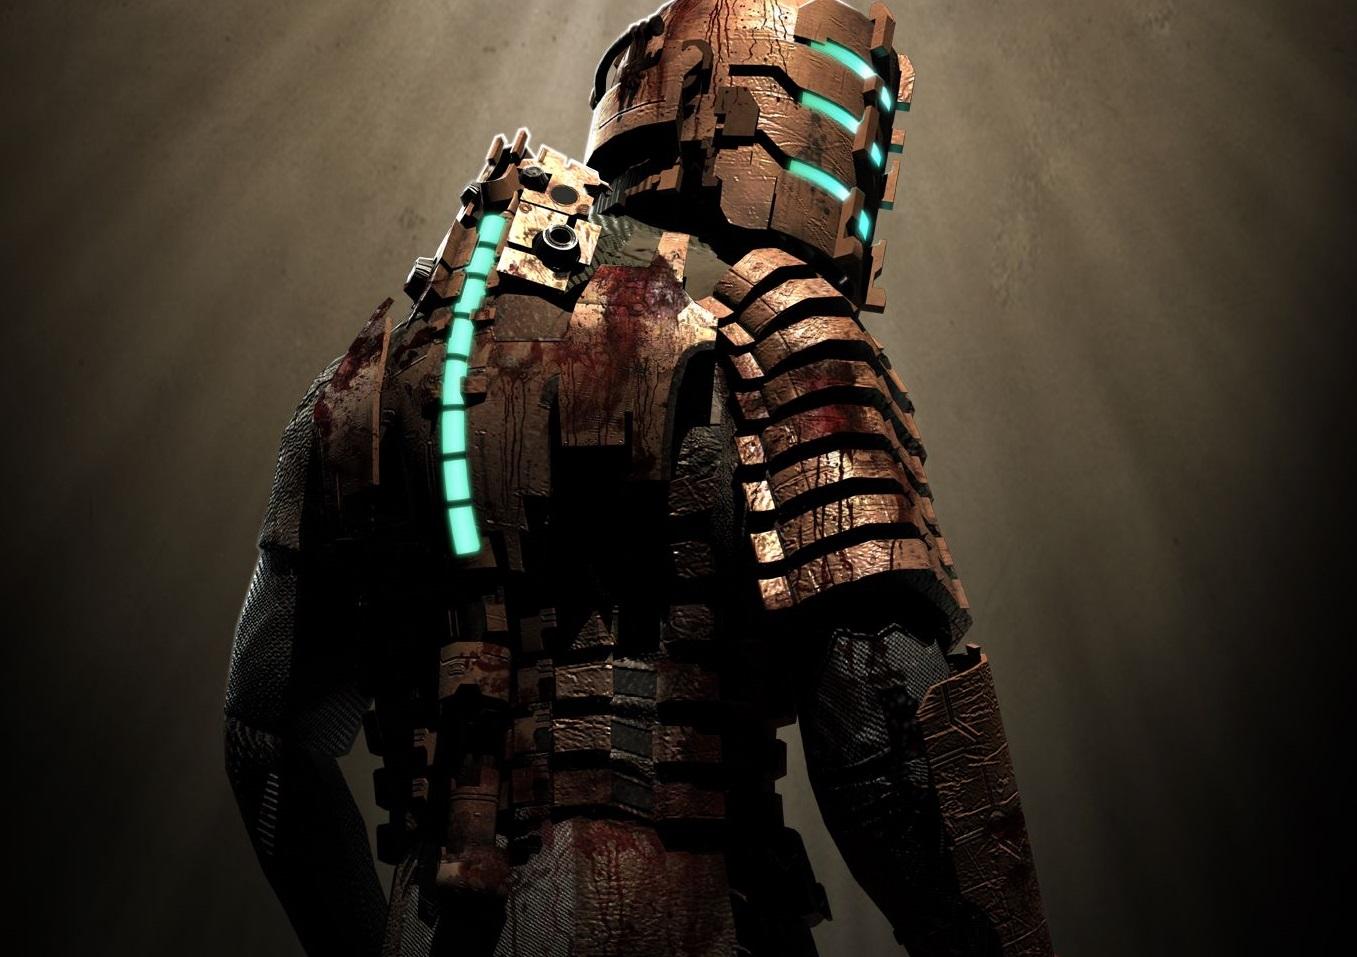 Расписание стримов «Канобу»: Dead Space, Assassin's Creed: Odyssey и CoD: Black Ops 4